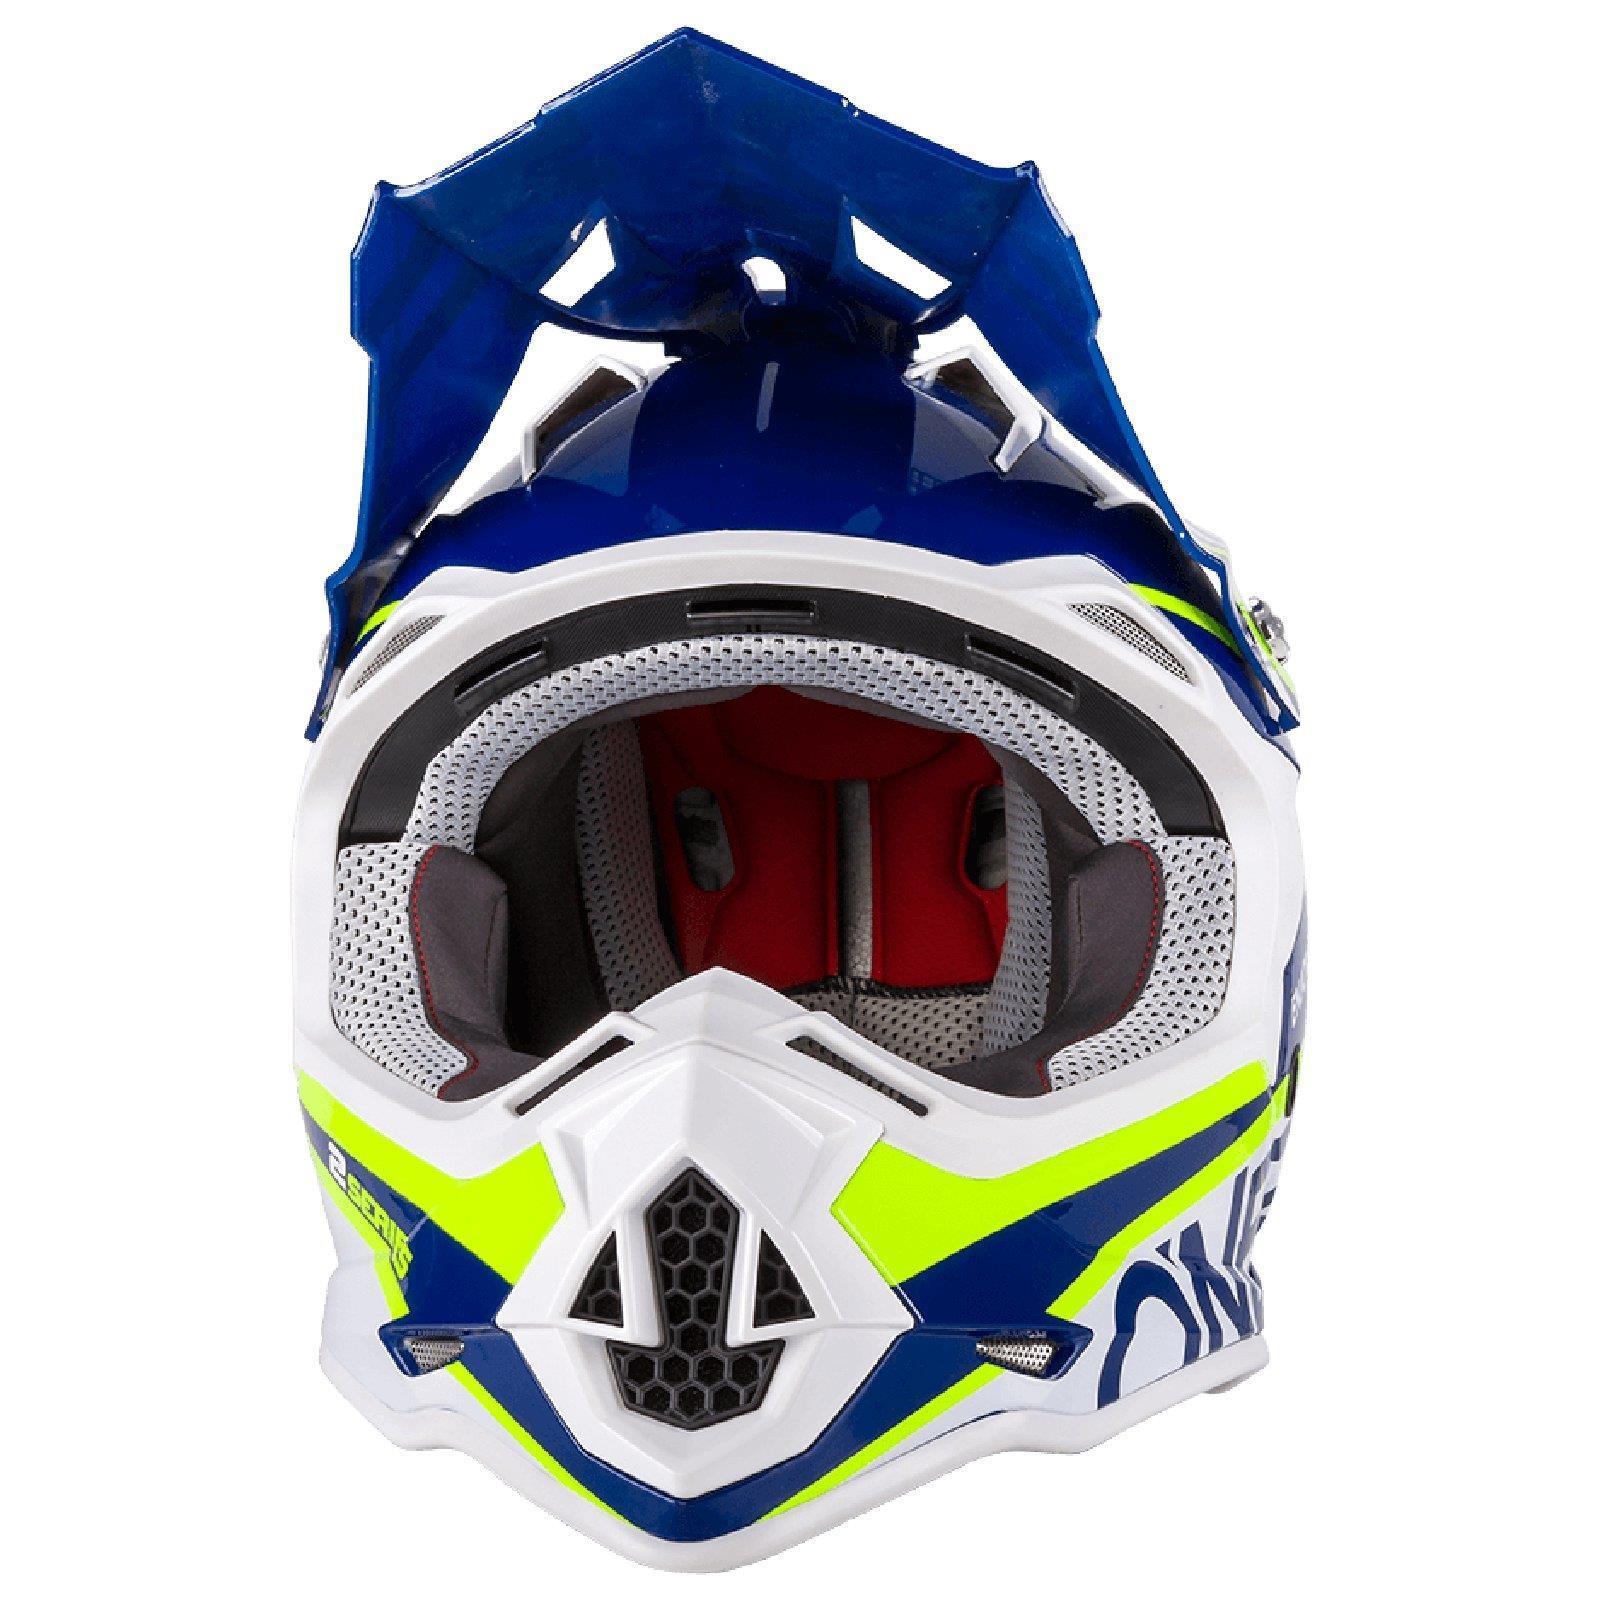 ONEAL-2-Series-RL-SPYDE-moto-cross-MX-Casco-Enduro-Trail-QUAD-OFFROAD-MOTO miniatura 8